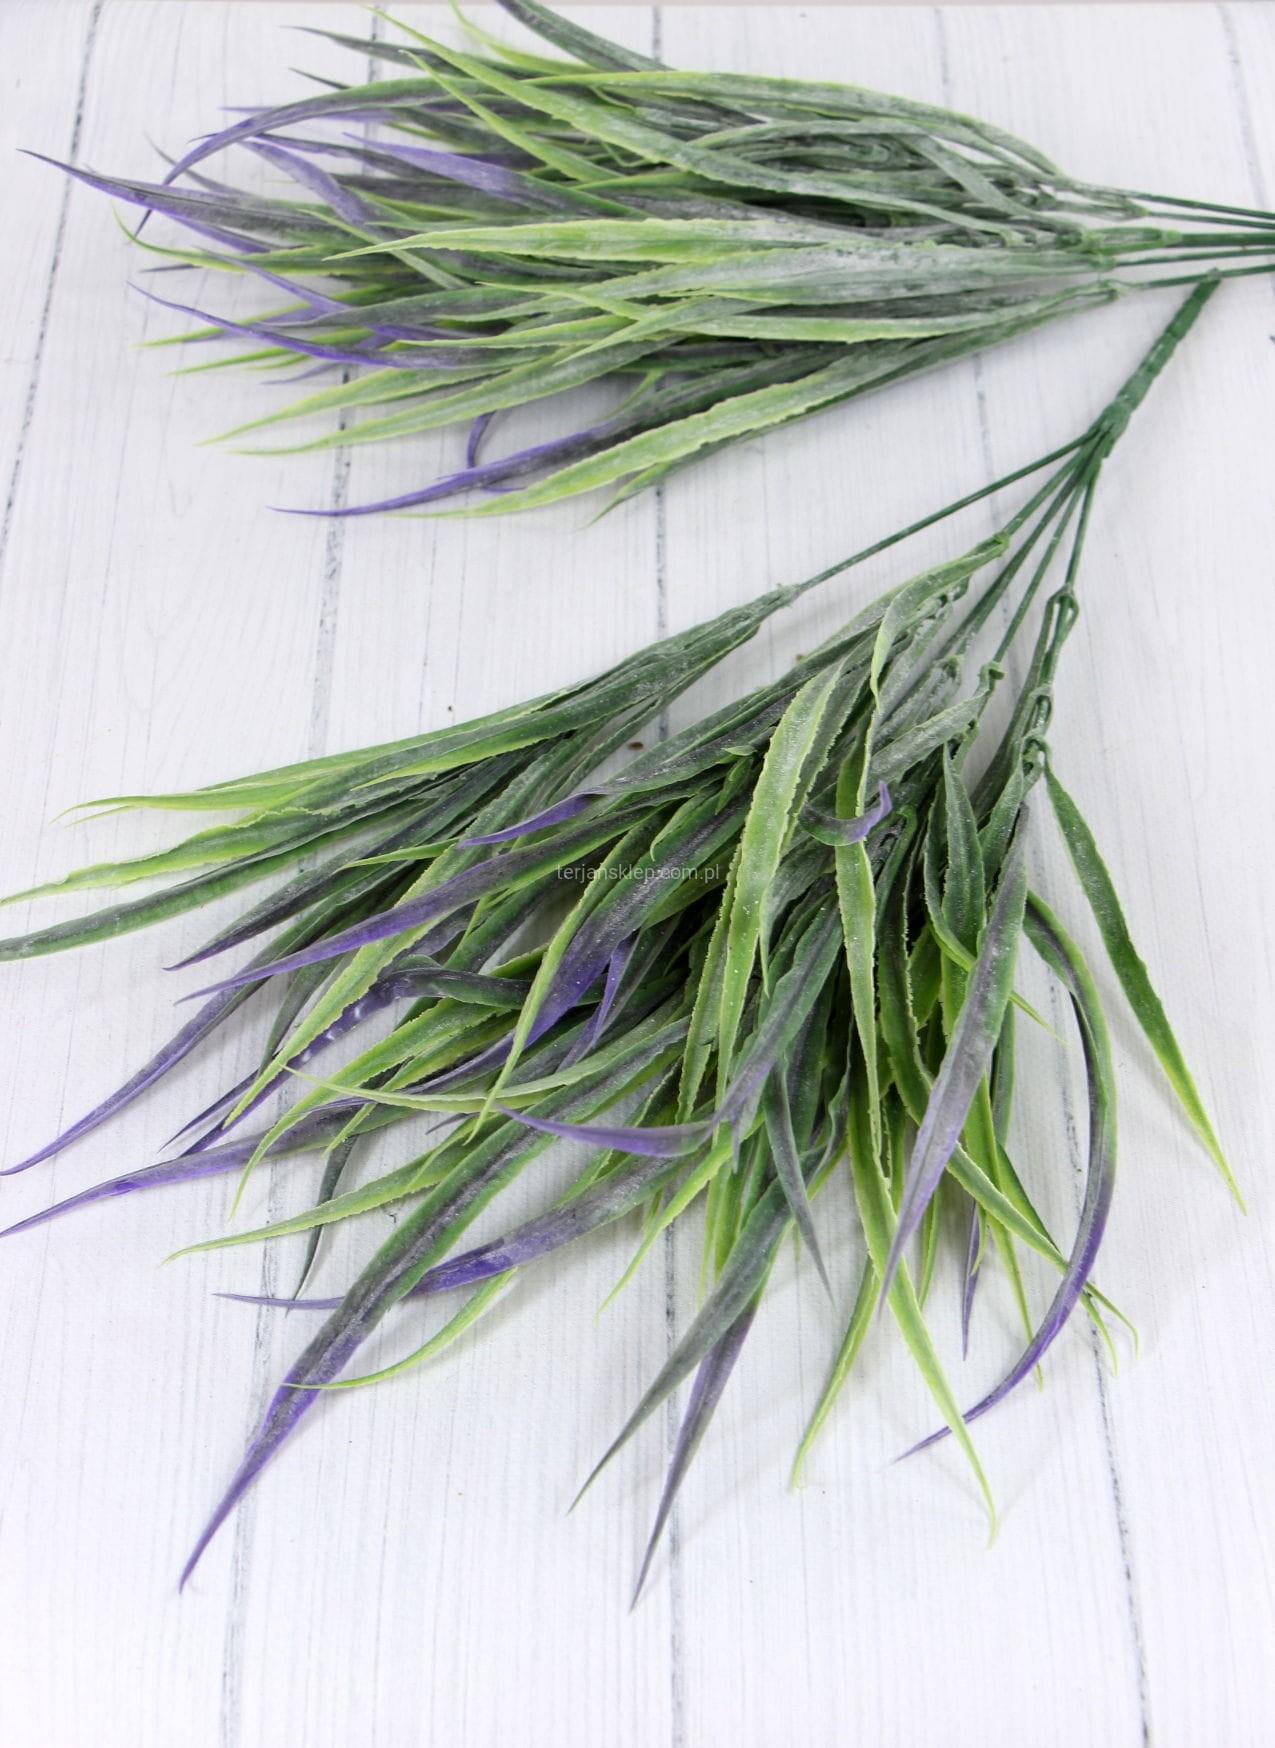 1c633fbbb1f383 Bukiet traw plast. CV08223 (2 x 4 zł) green violet - Sklep ...